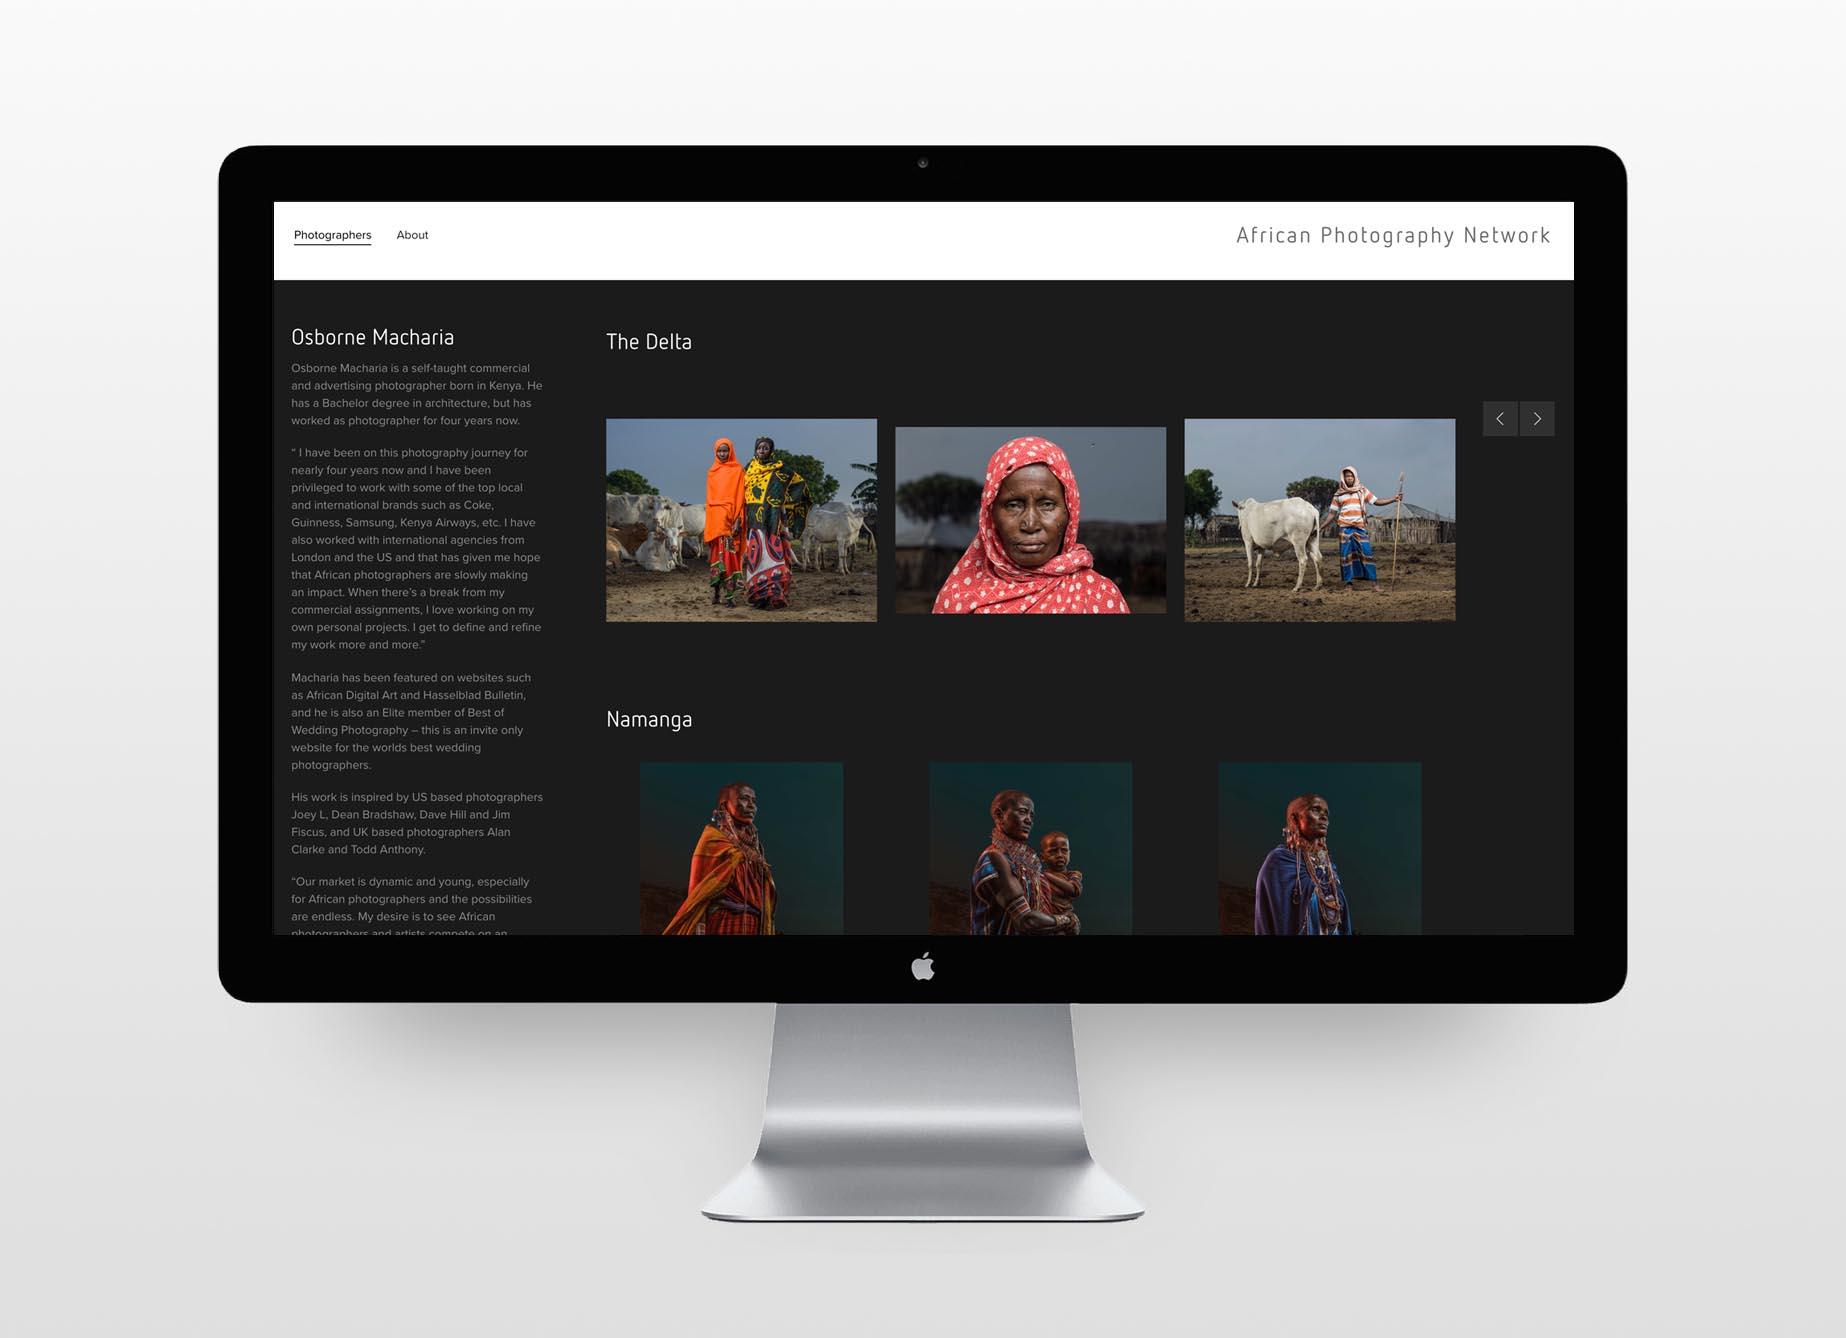 AfricanPhotographyNetwork_screen_01.jpg